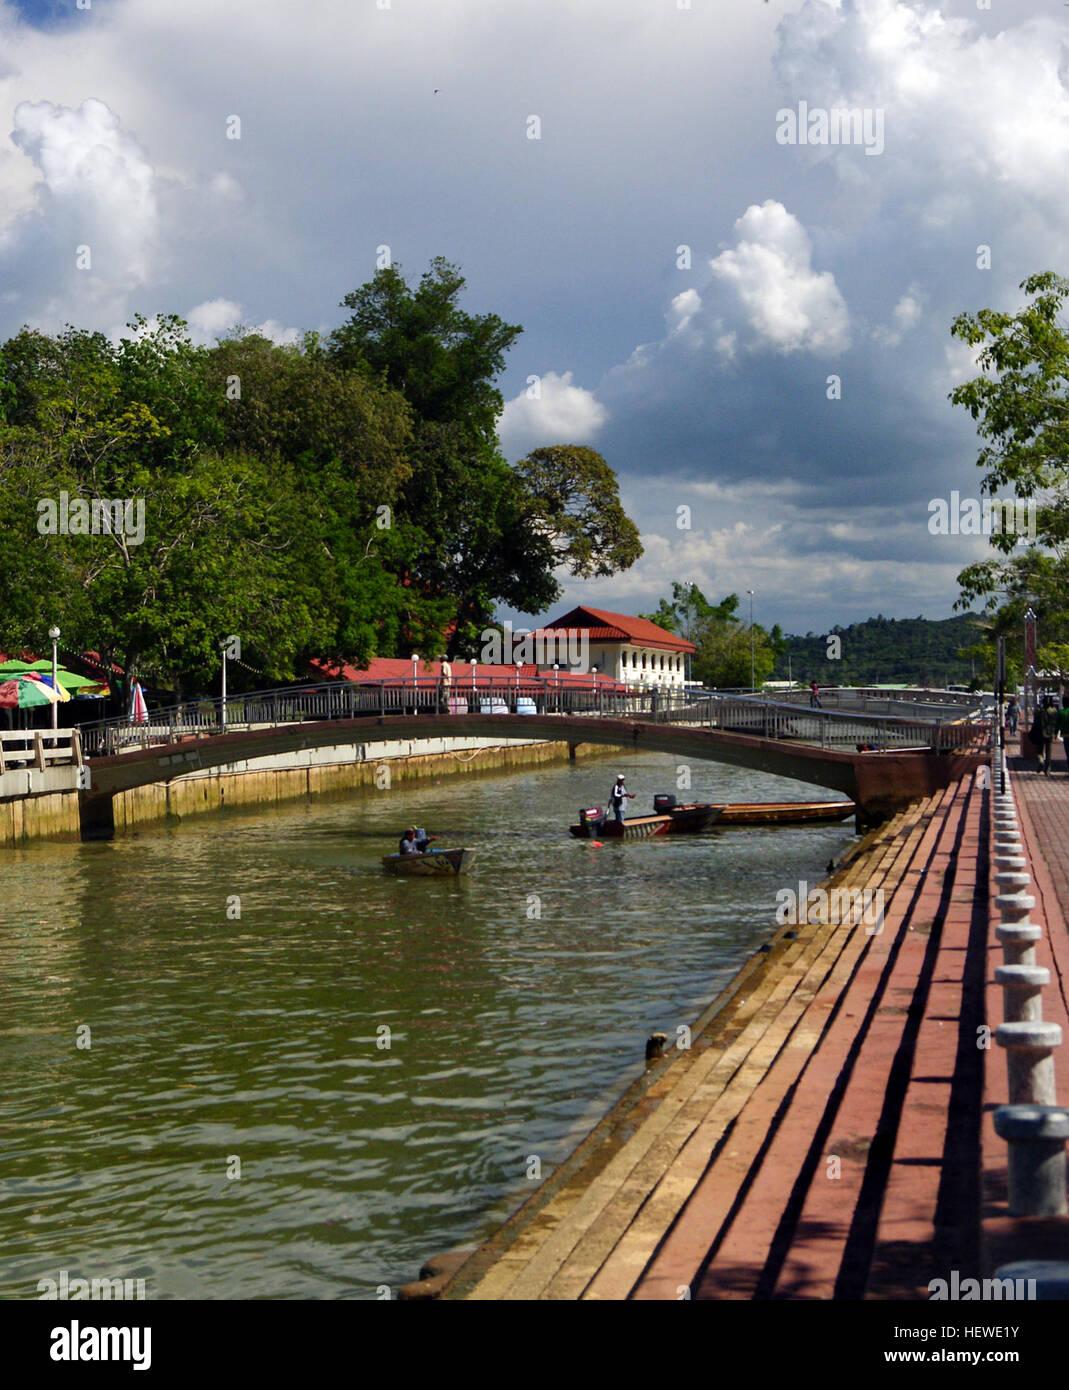 ication (,),Bandar Seri Begawan,Brunei,Brunei Heritage Tour,Water way,Water ways Brunei,canal - Stock Image